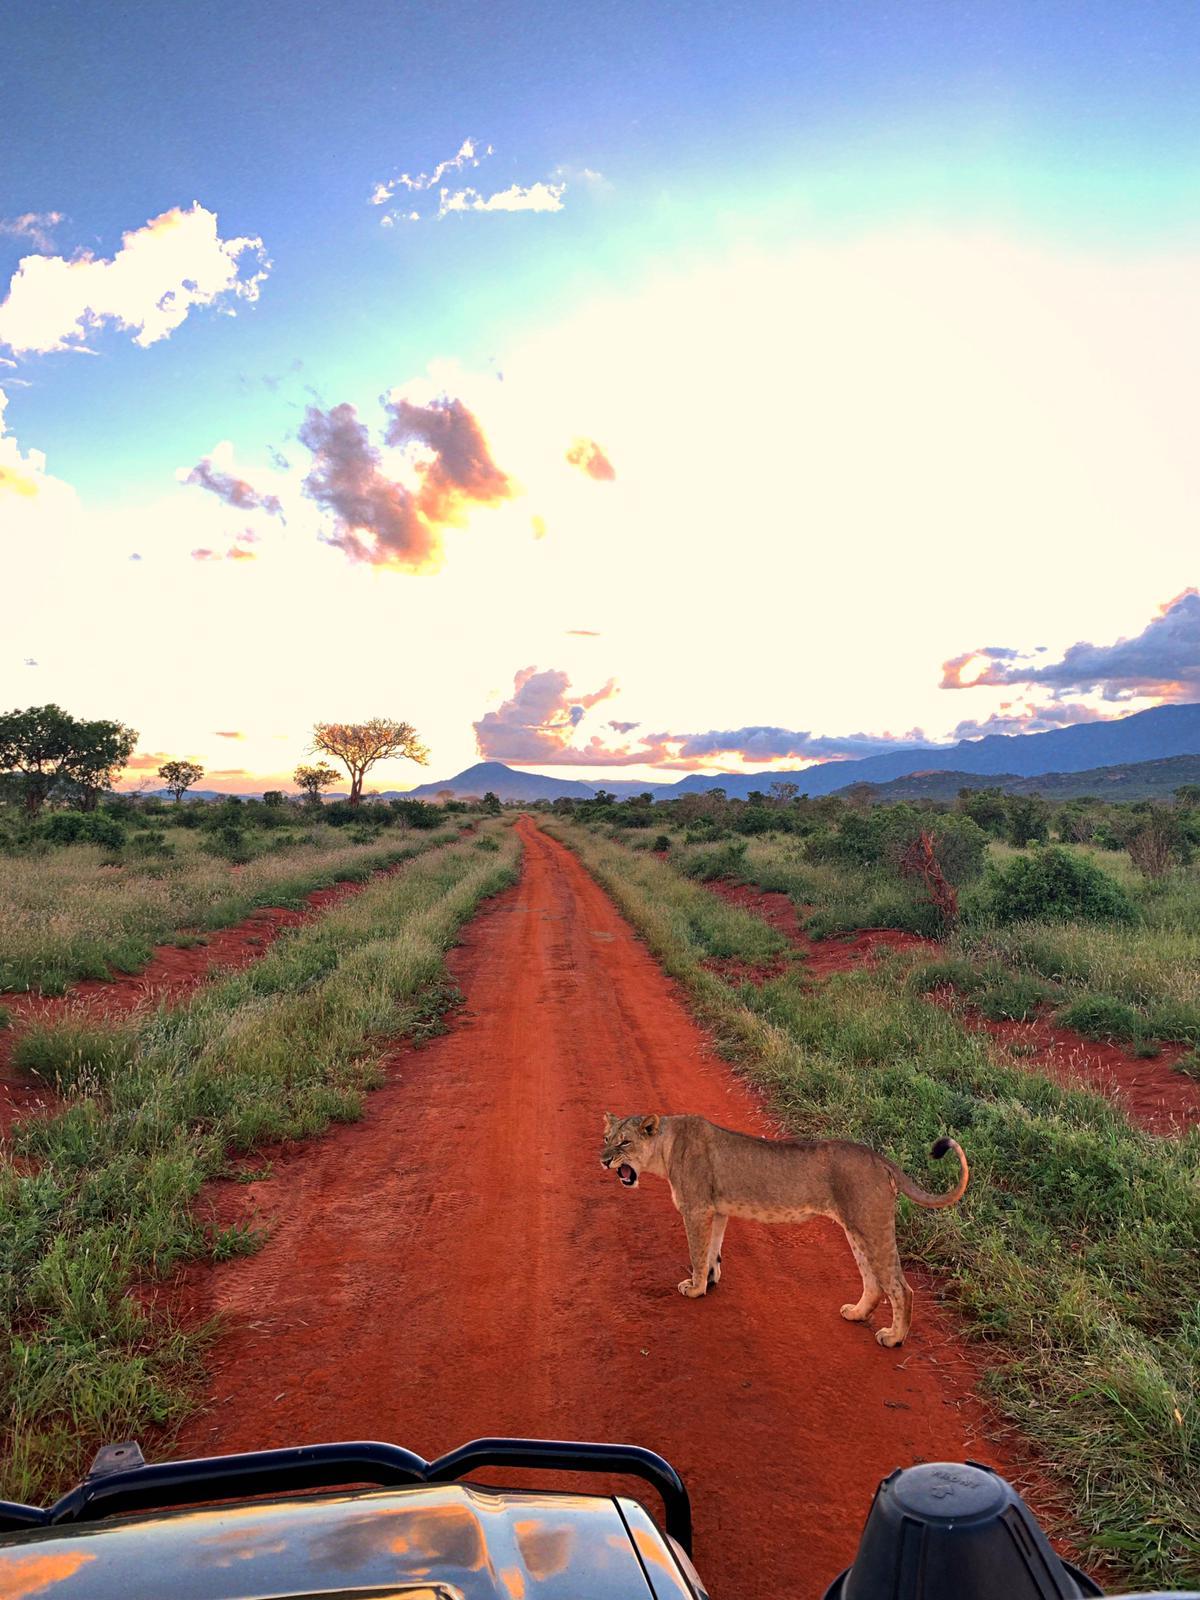 WhatsApp Image 2019 12 16 at 13.45.27 - Safari Masai Mara . Lago Nakuru . Amboseli . Taita Hills . Tsavo Est